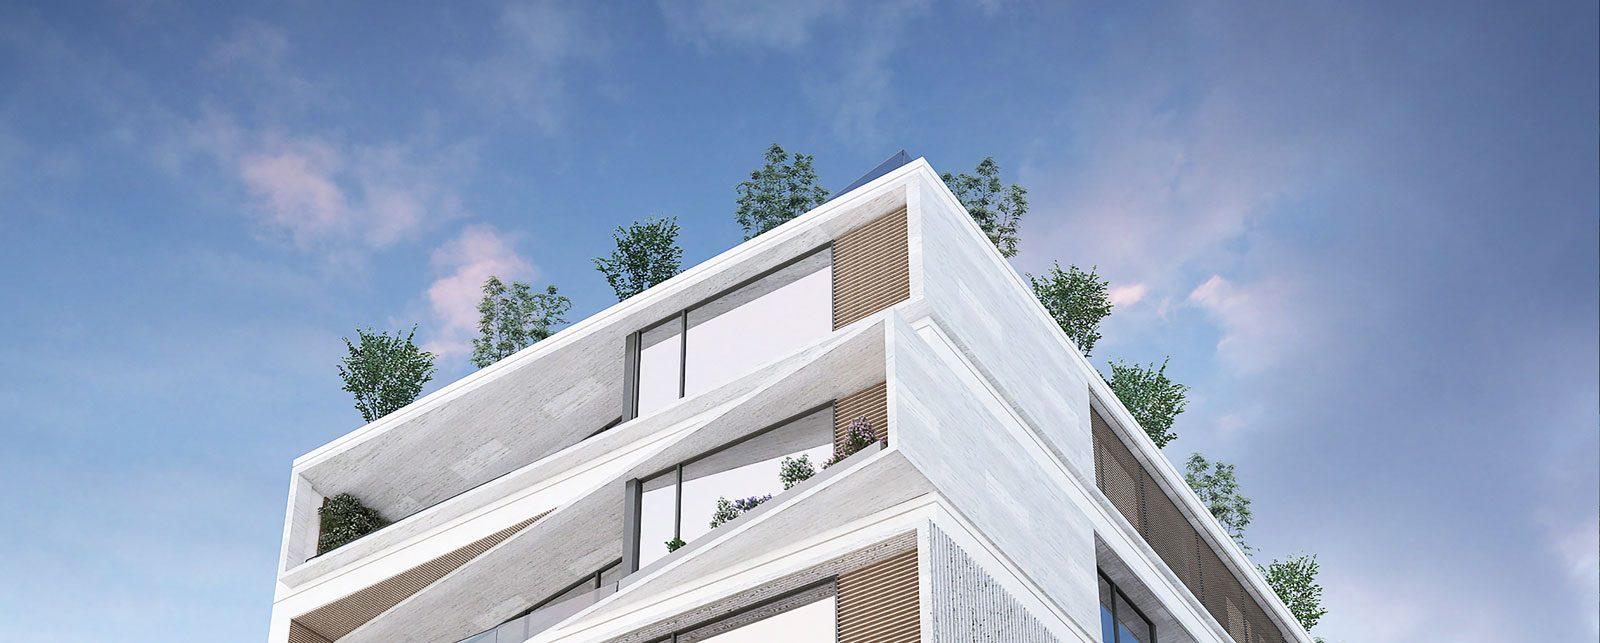 Yaser Residential Building